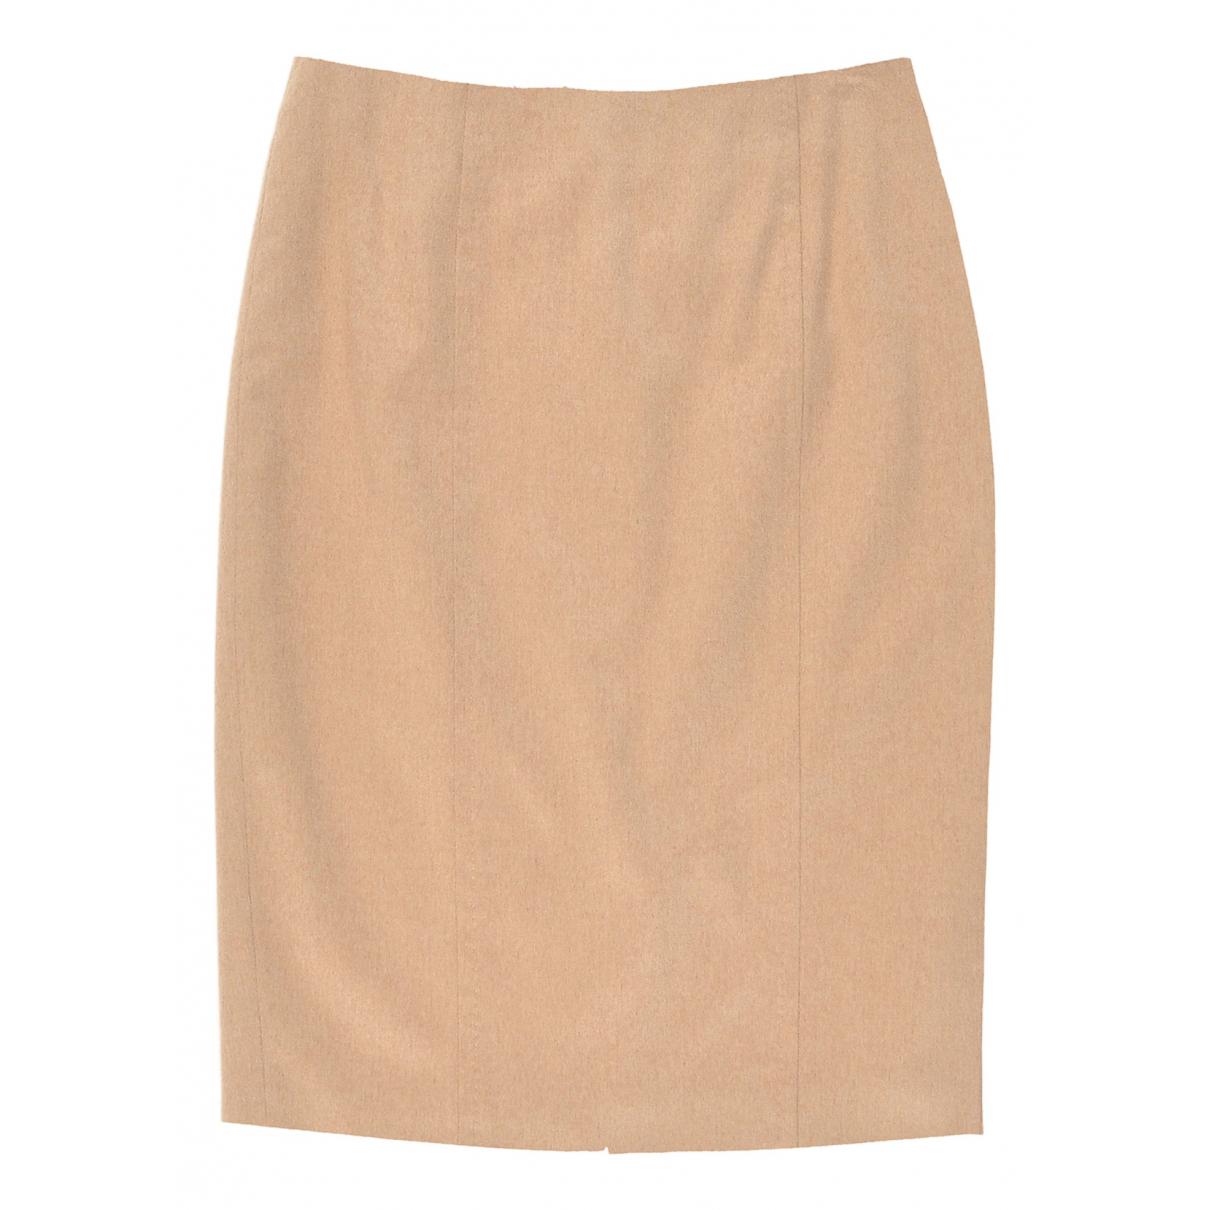 Max Mara \N Camel Wool skirt for Women 40 IT